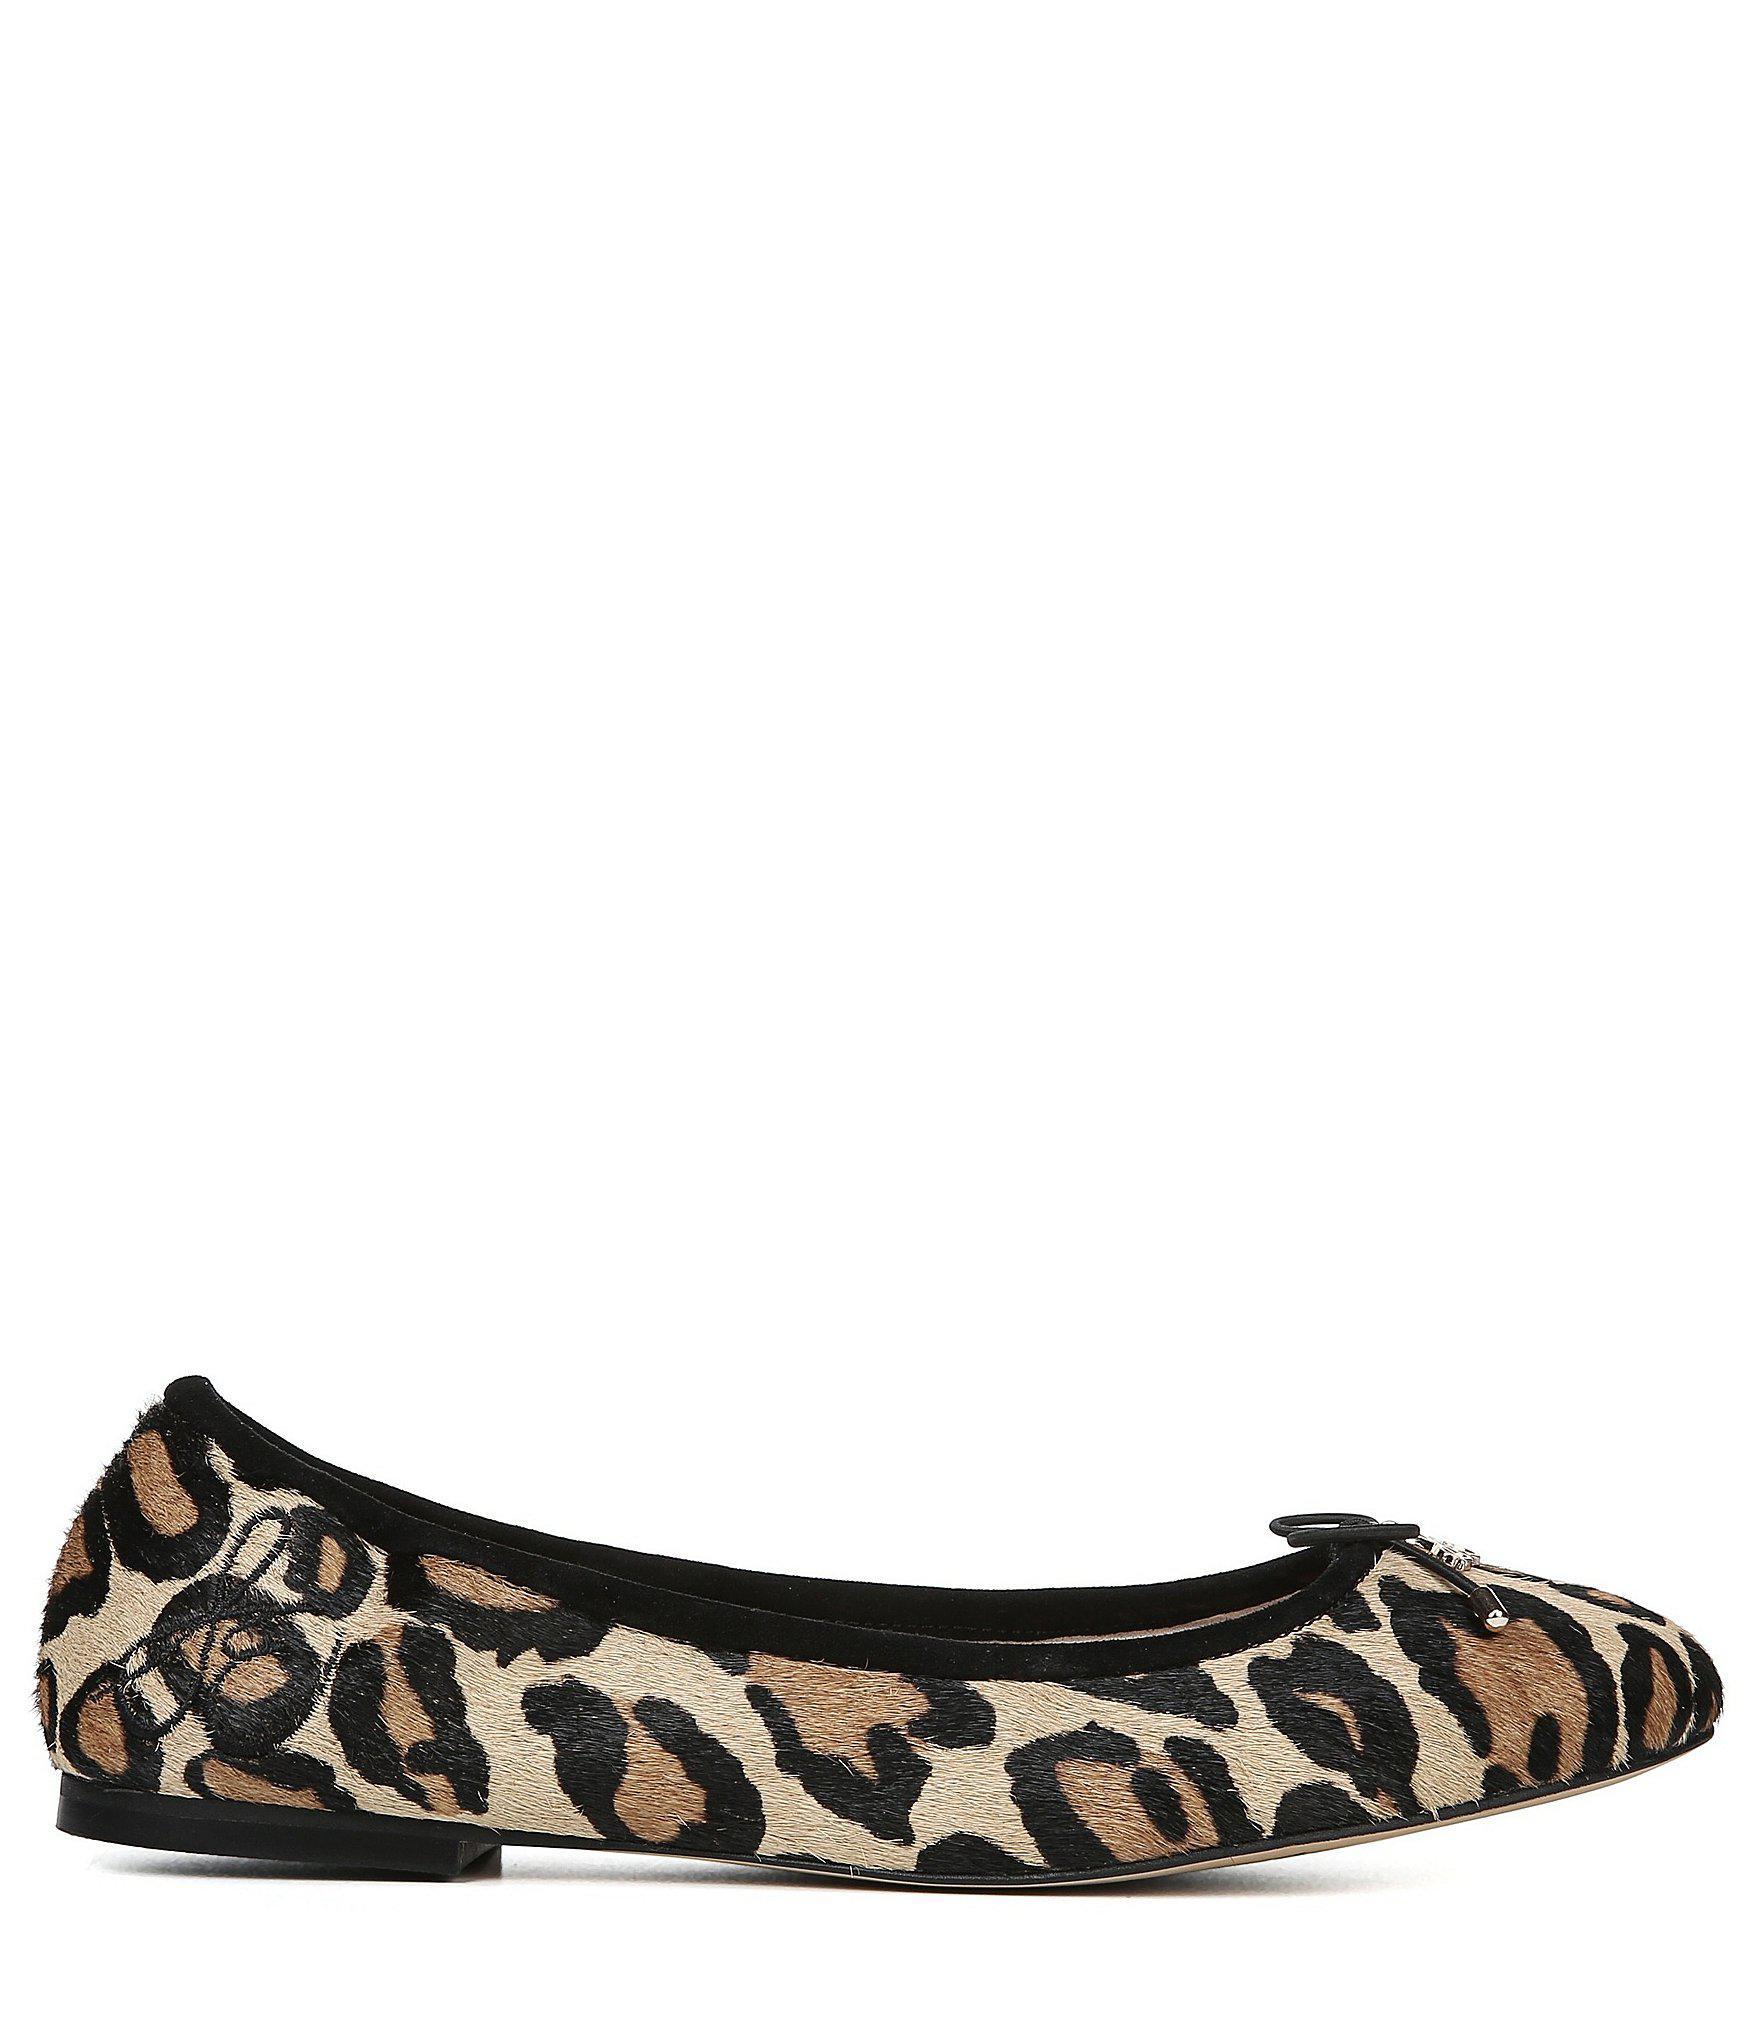 fdf62d903614ad Sam Edelman - Brown Felicia Leopard-print Flats - Lyst. View fullscreen